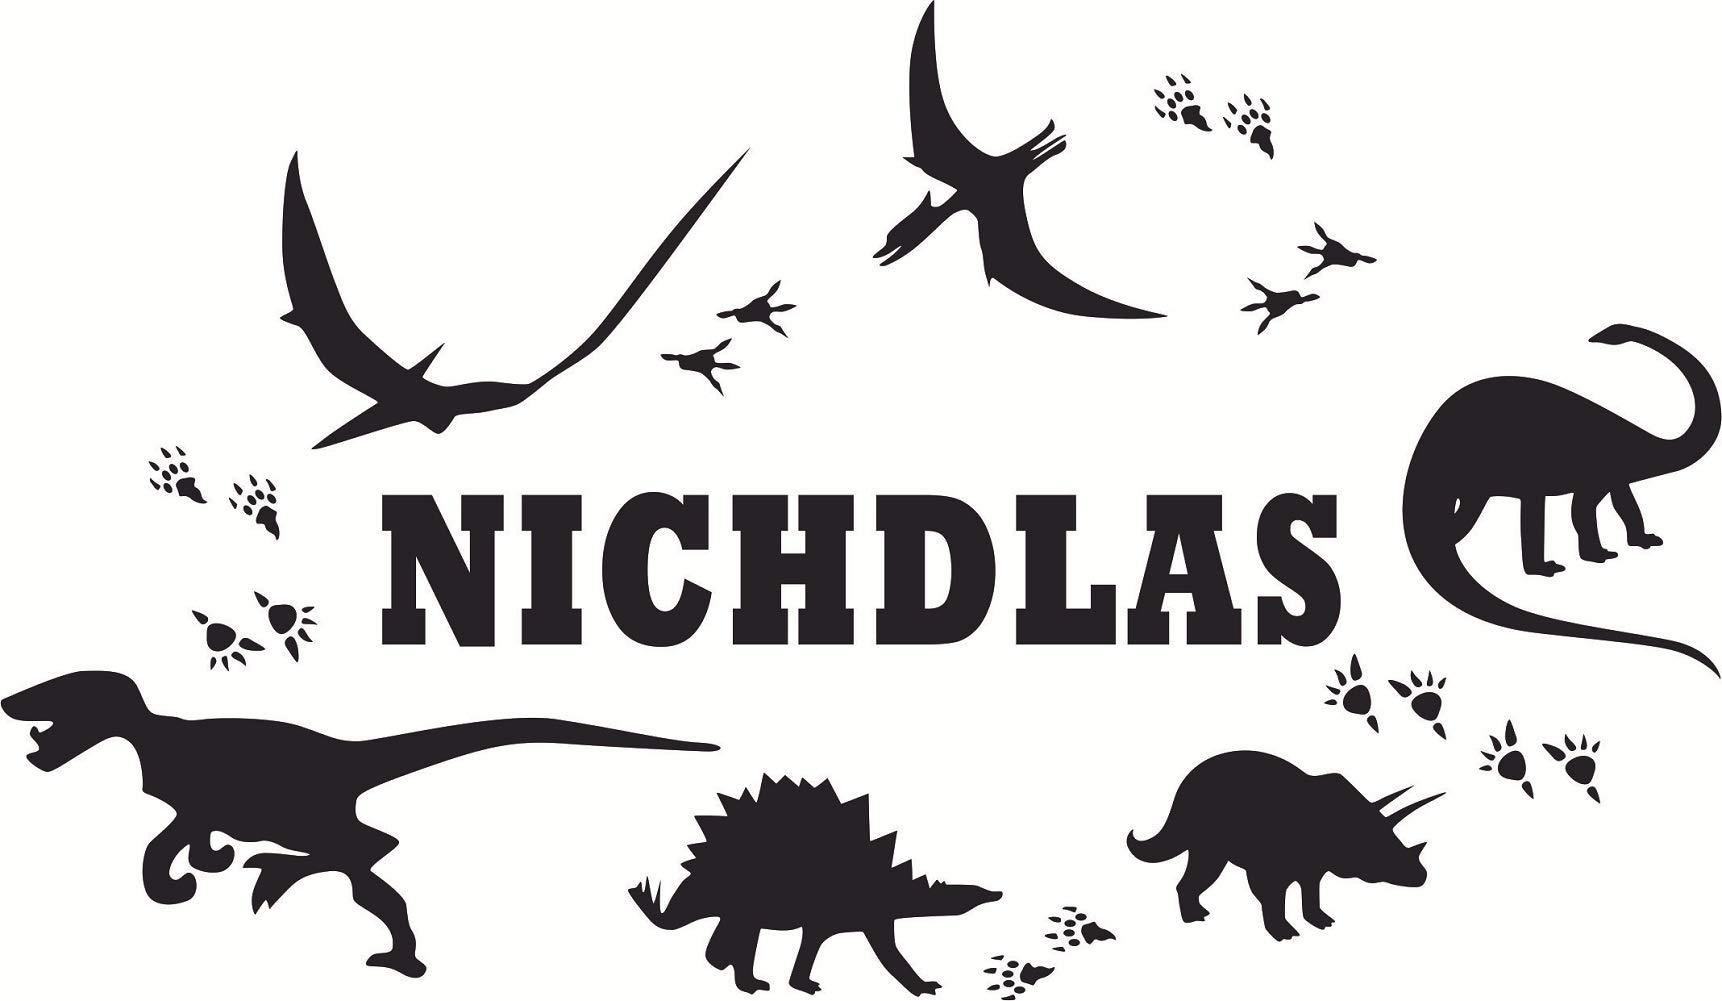 Cool Custom Made Personalized Dinosaur Footprint Name Wall Sticker